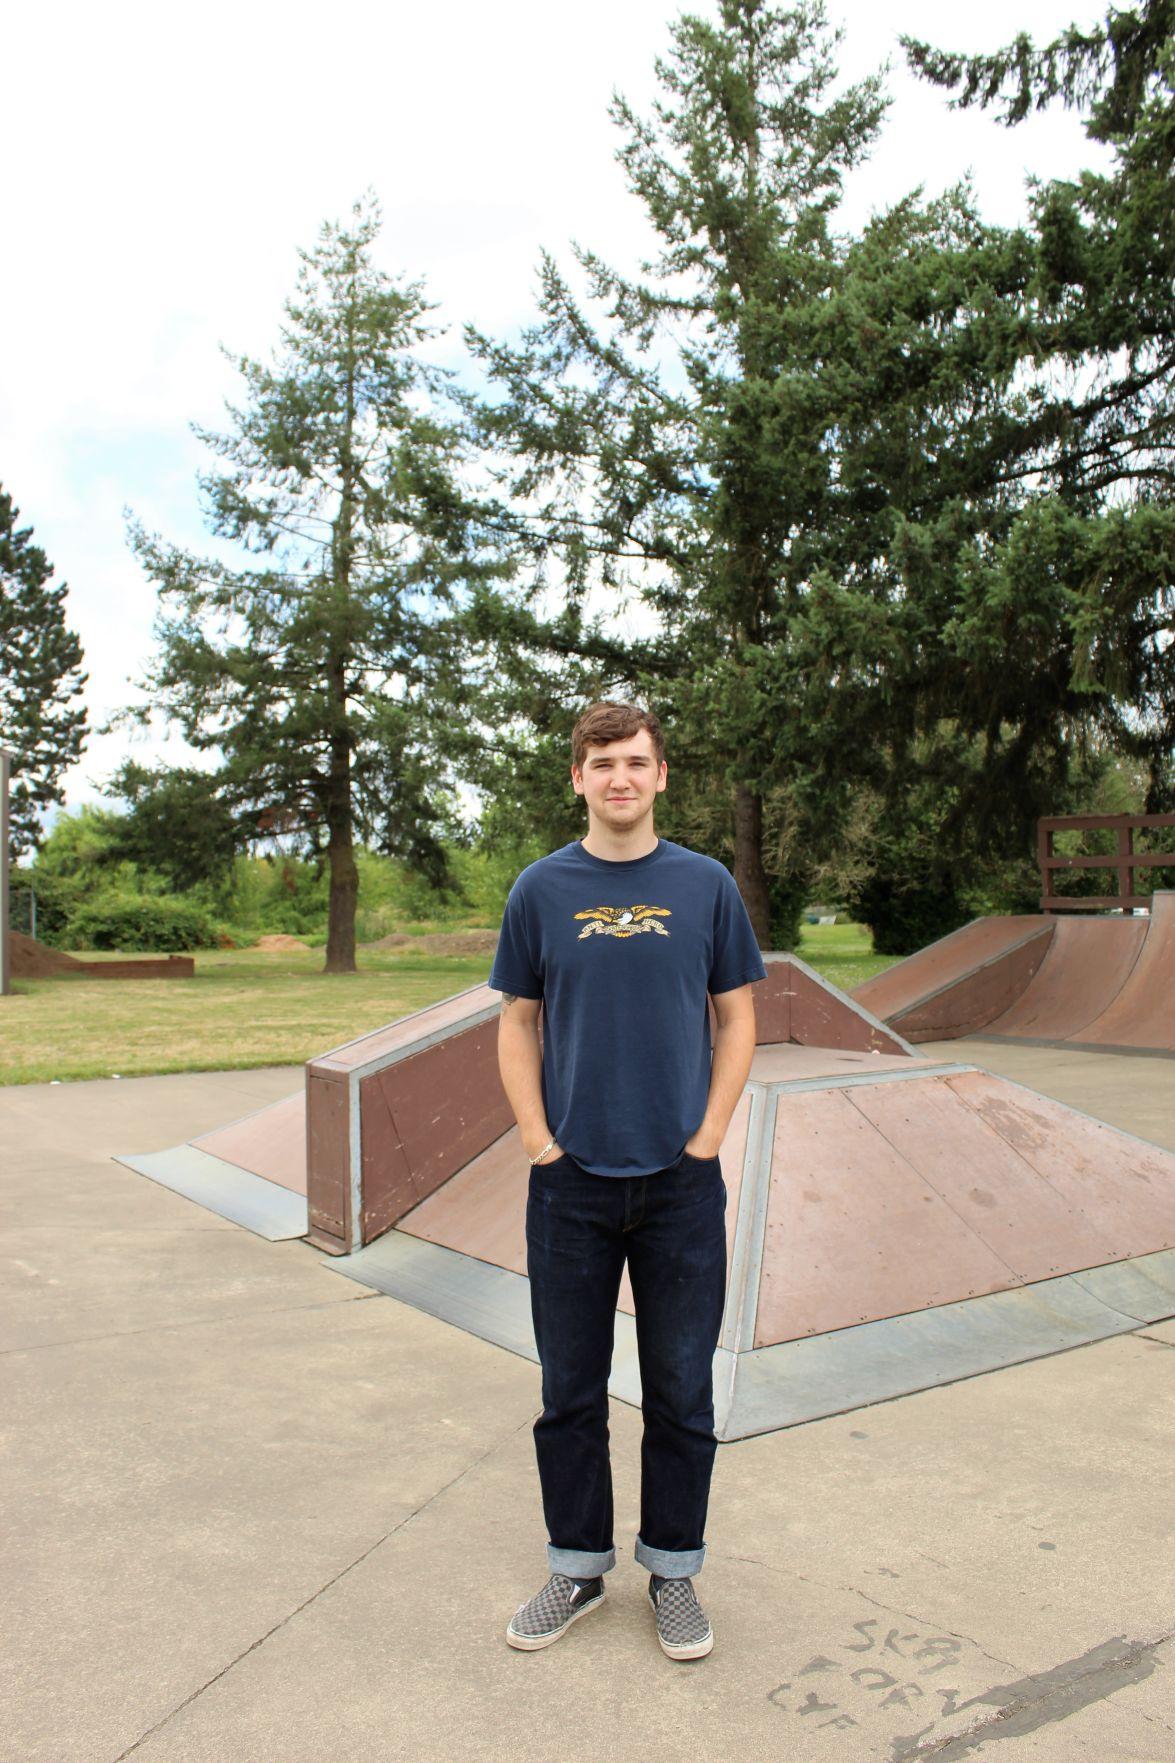 Cities combine for skate park effort